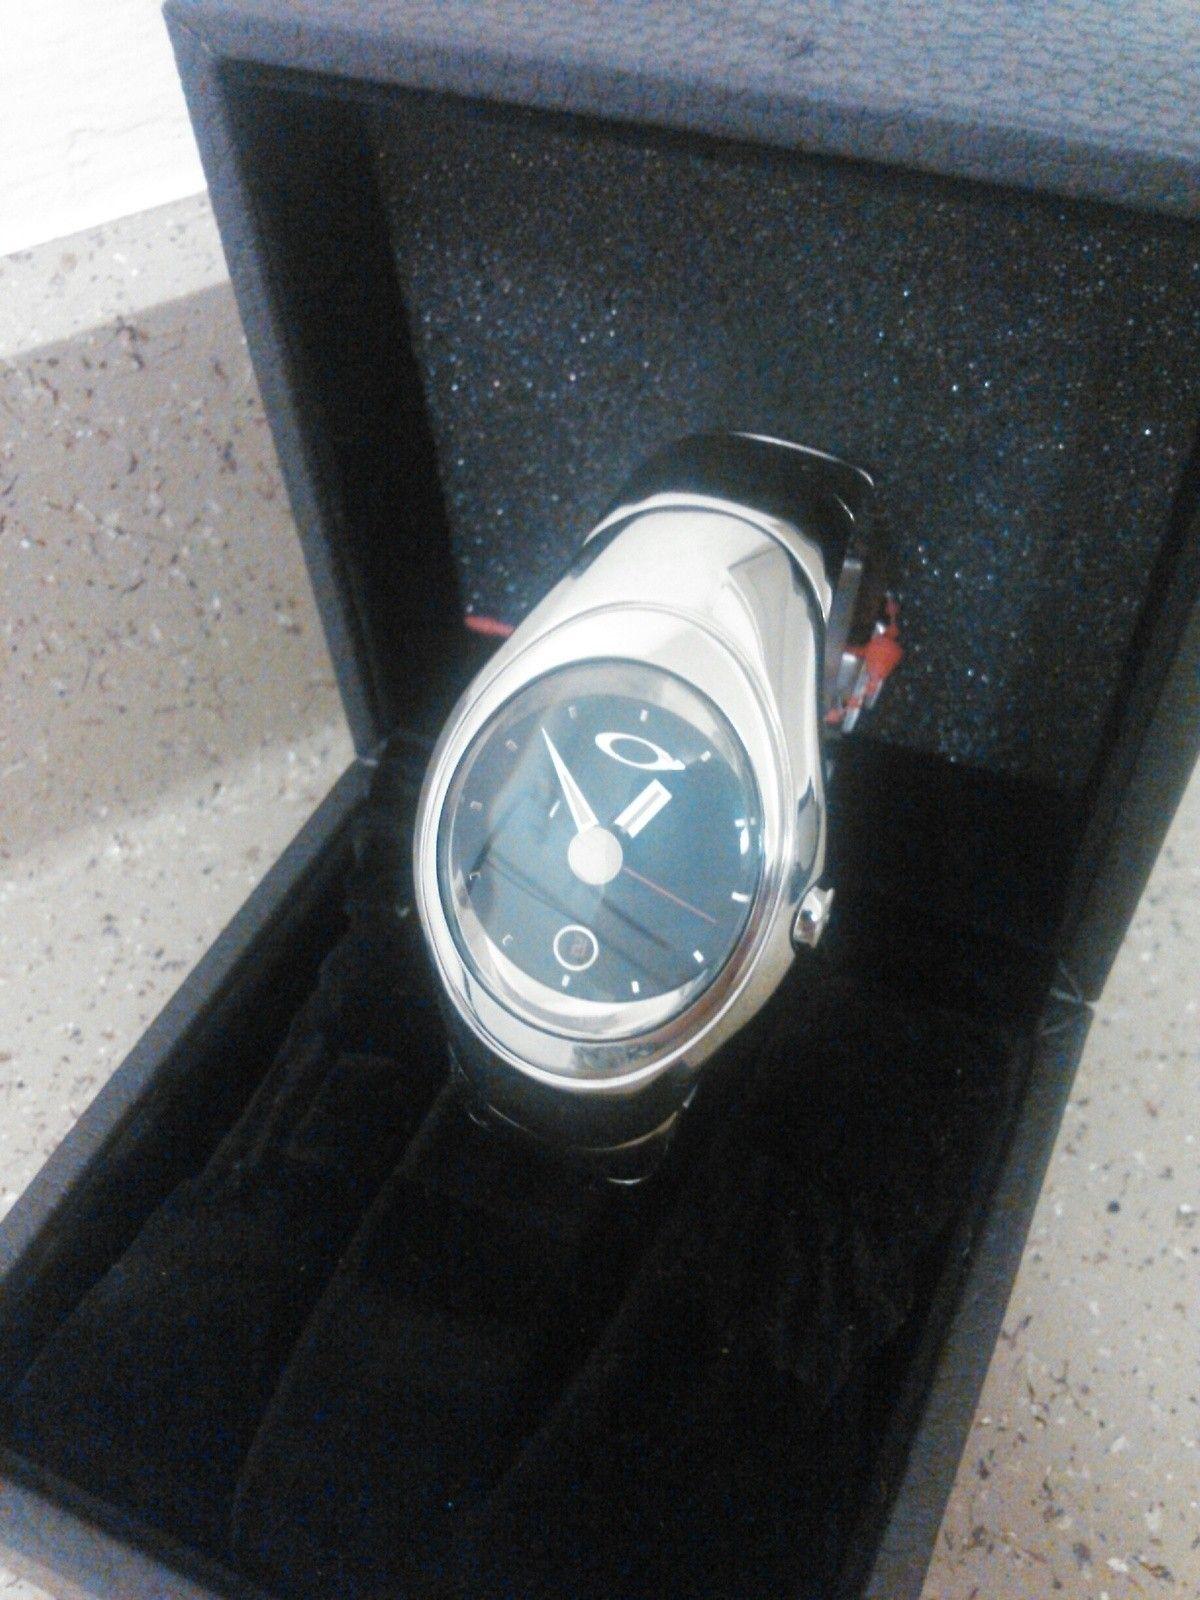 Hydrophobic watch - NCM_0009.jpg